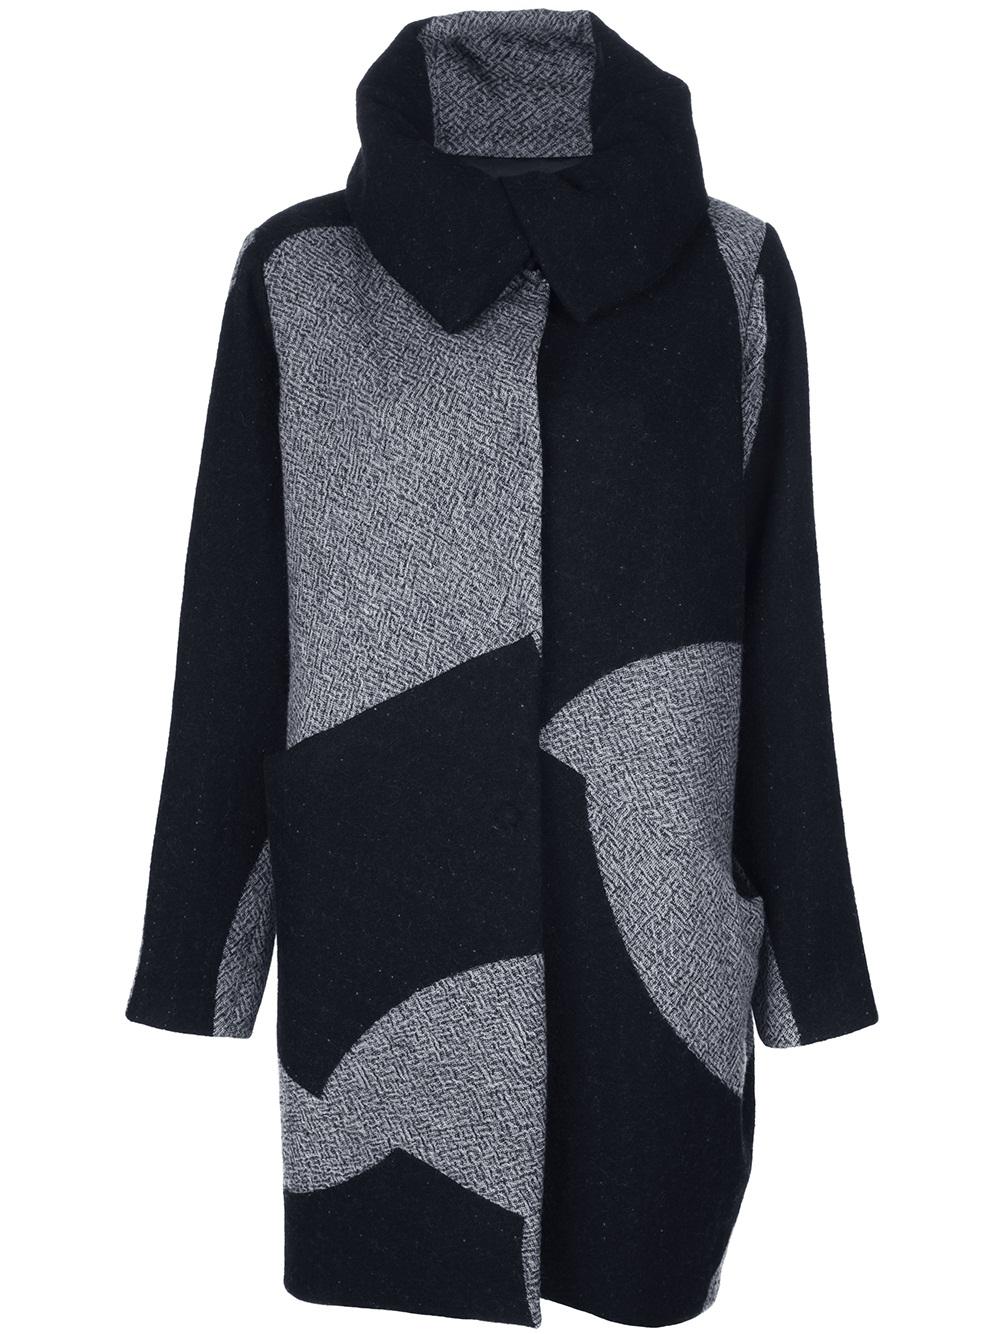 shu moriyama oversized coat.jpg